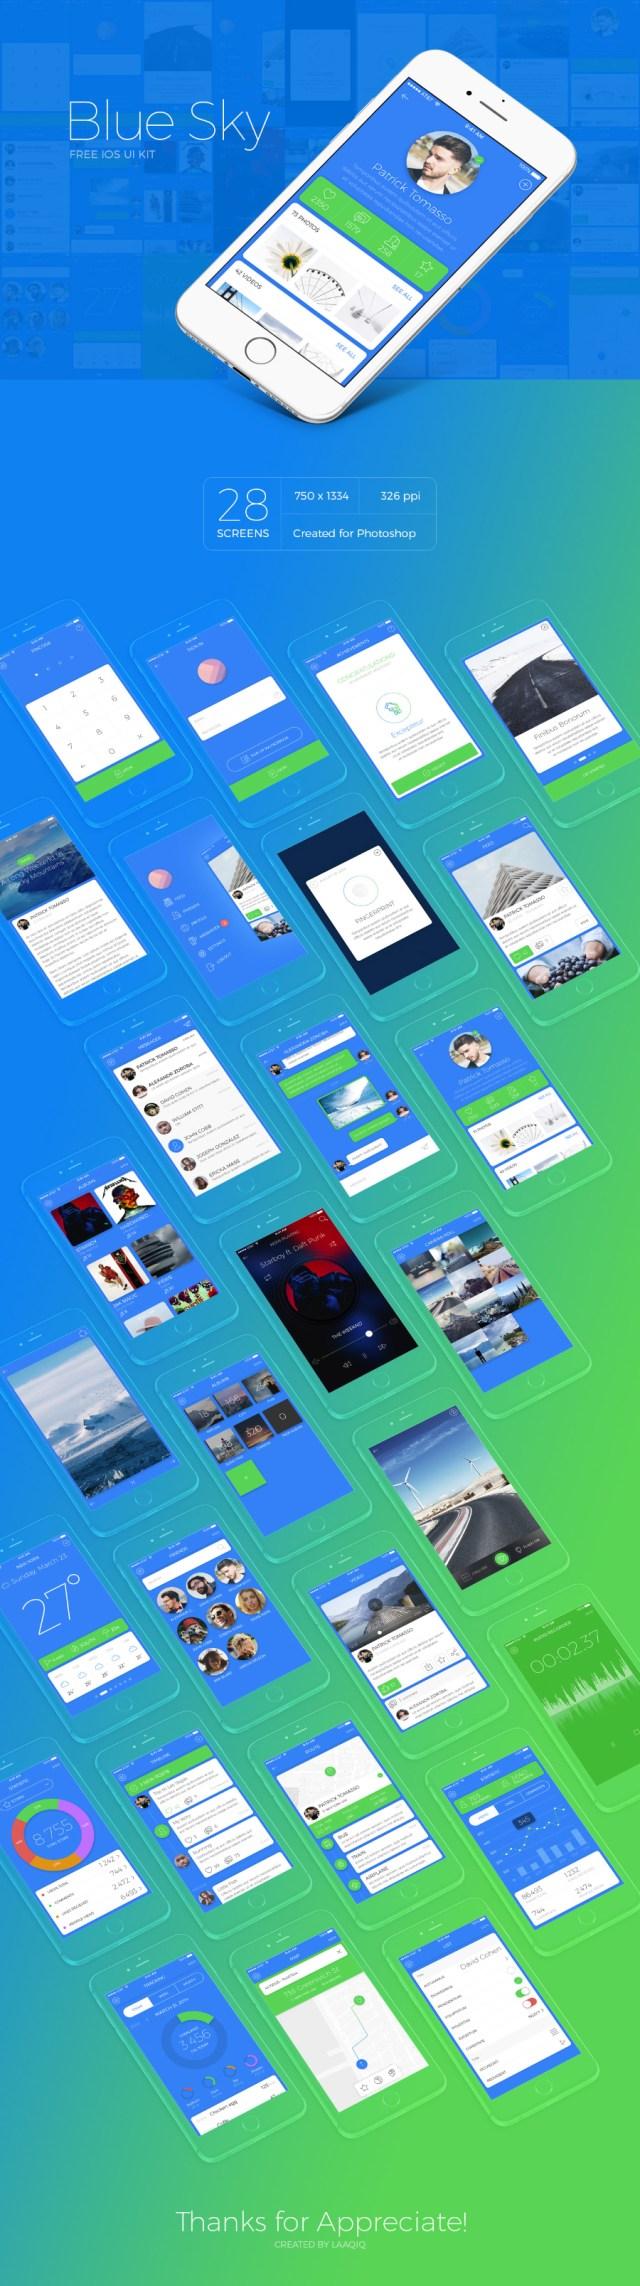 Blue Sky Free iOS UI Kit